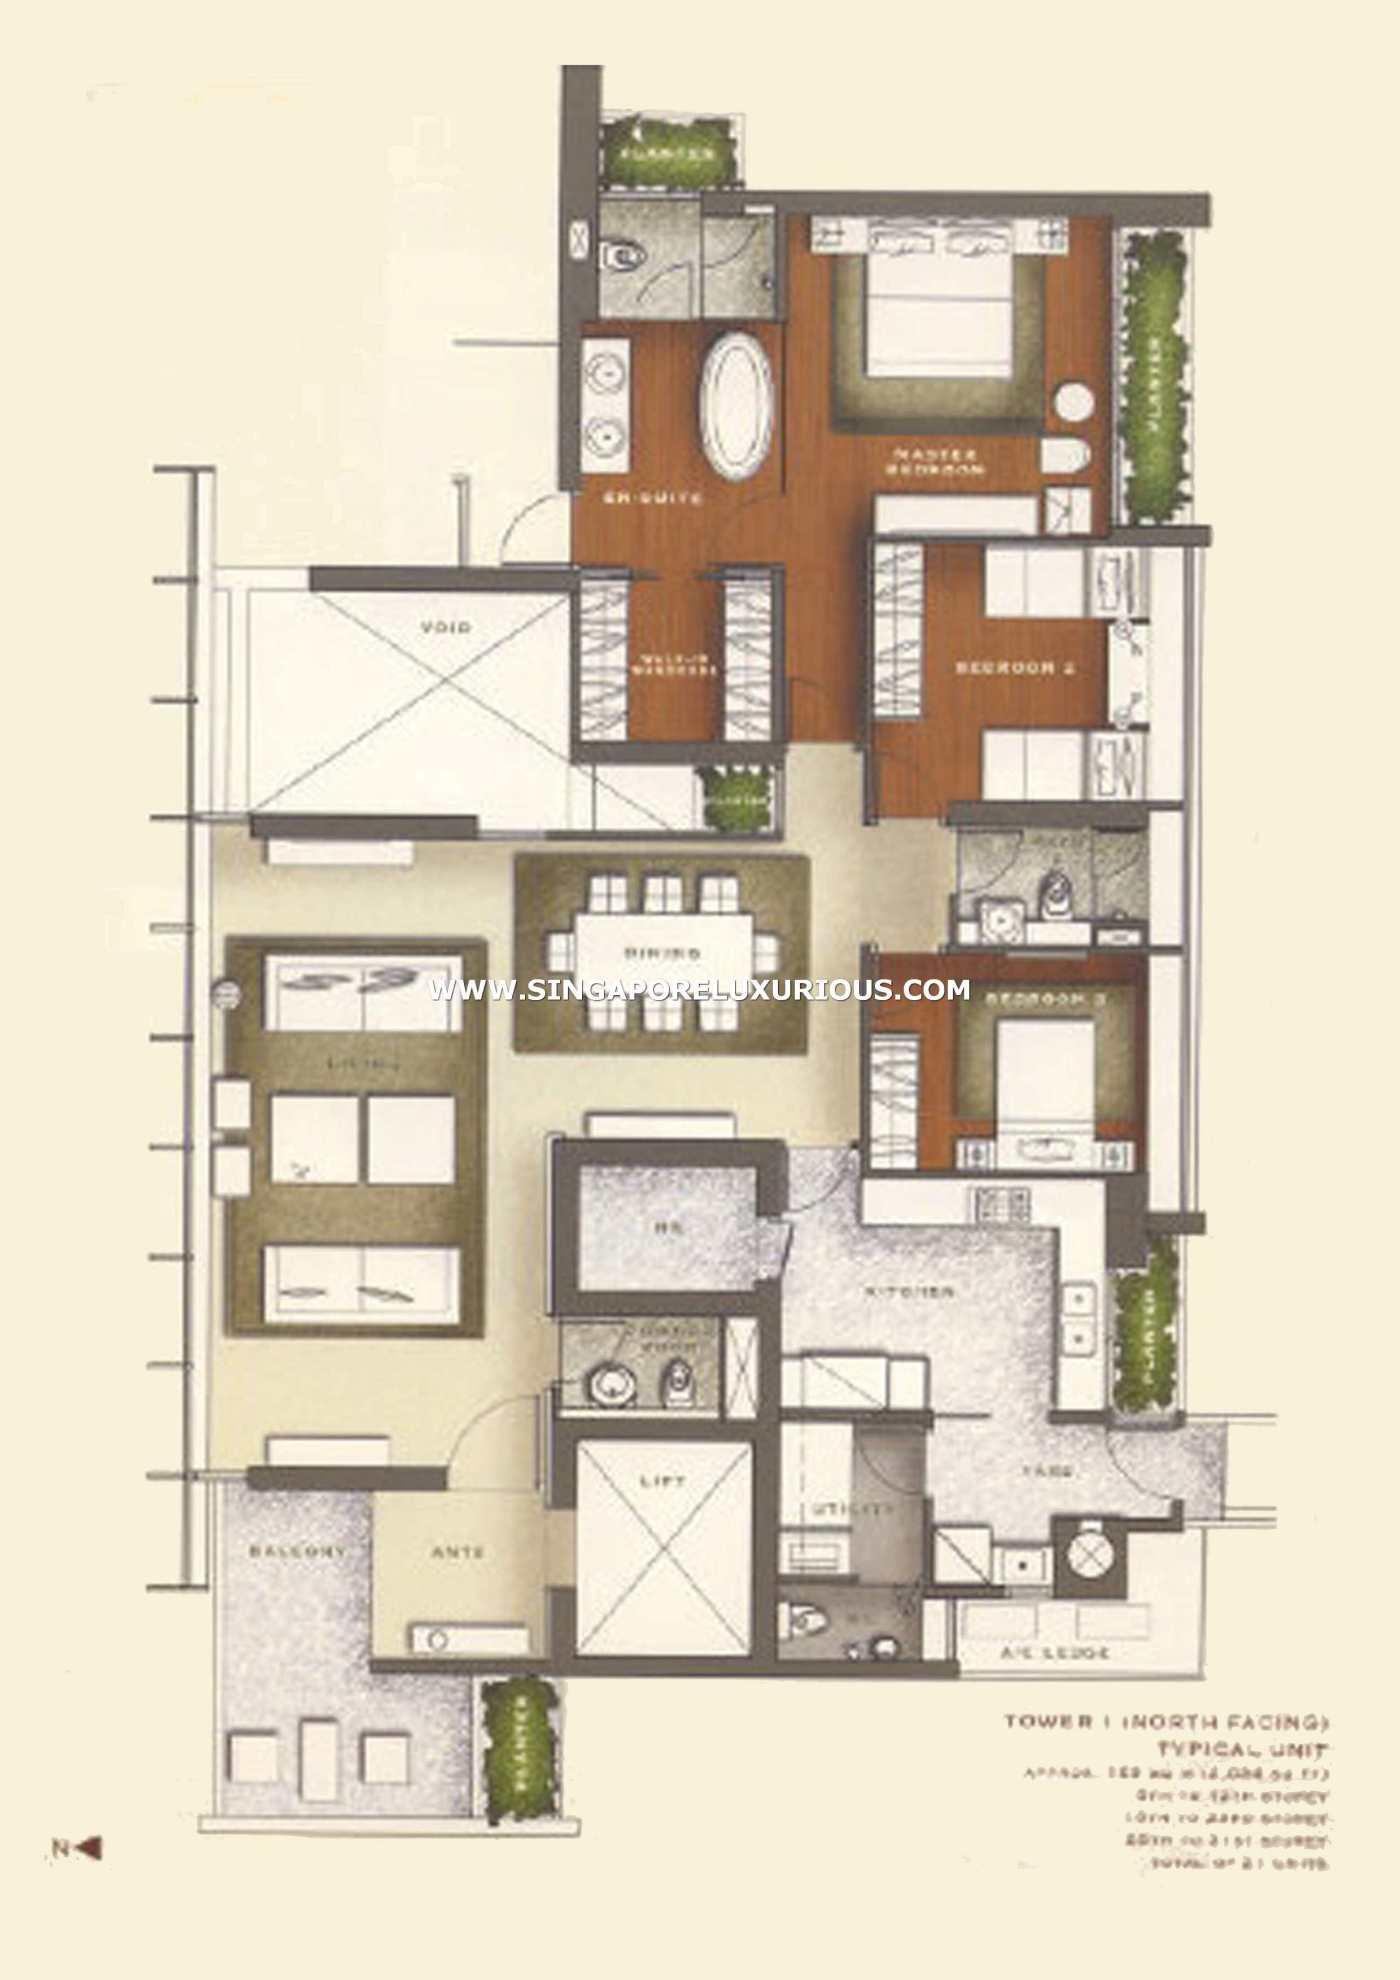 Boulevard Residences Site Floor Plan Singapore Luxurious Property